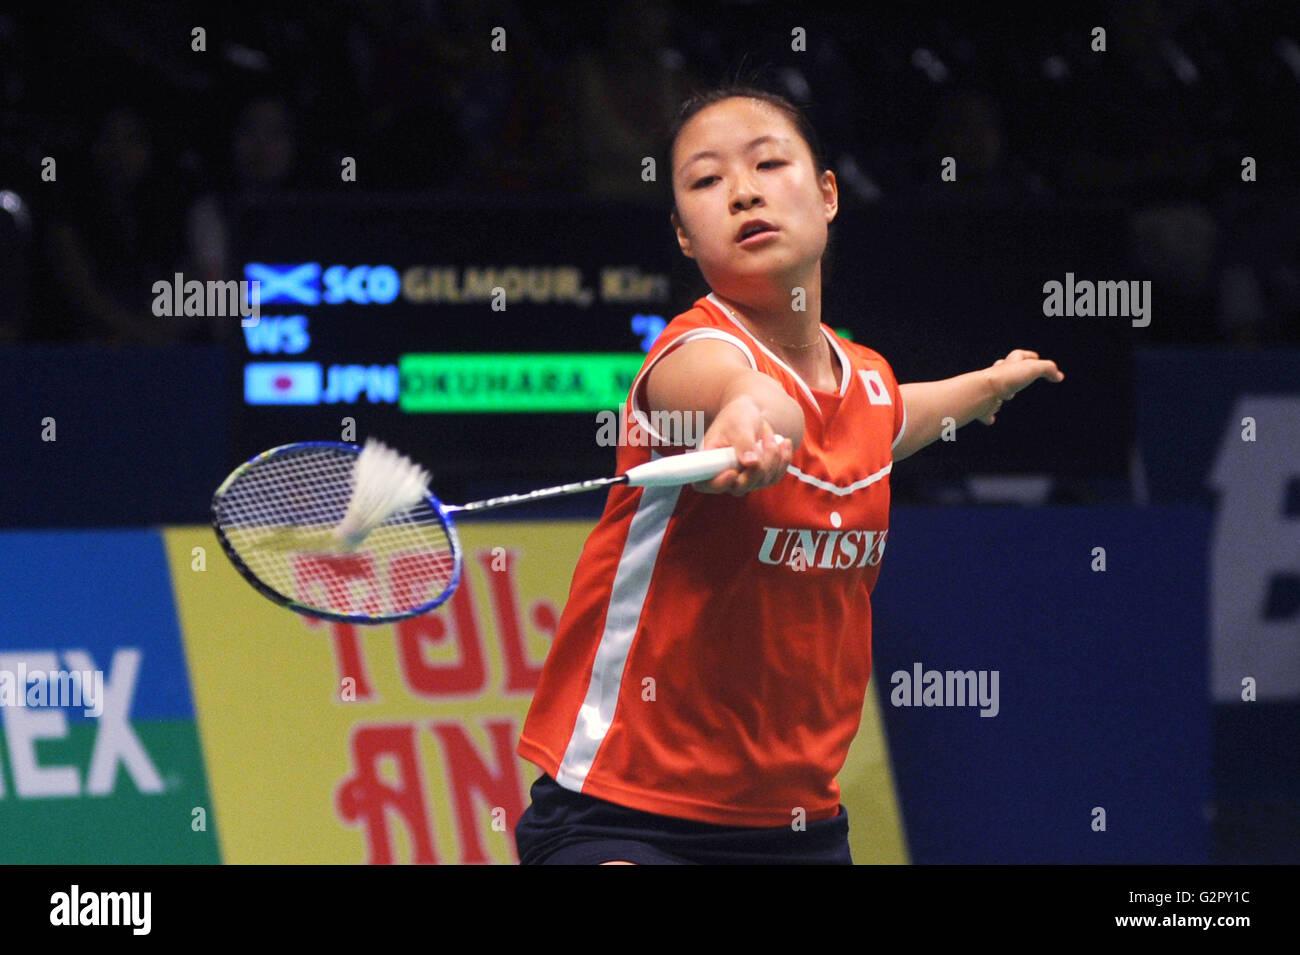 Jakarta Indonesia on June 02 2016 Nozomi Okuhara of Japan win